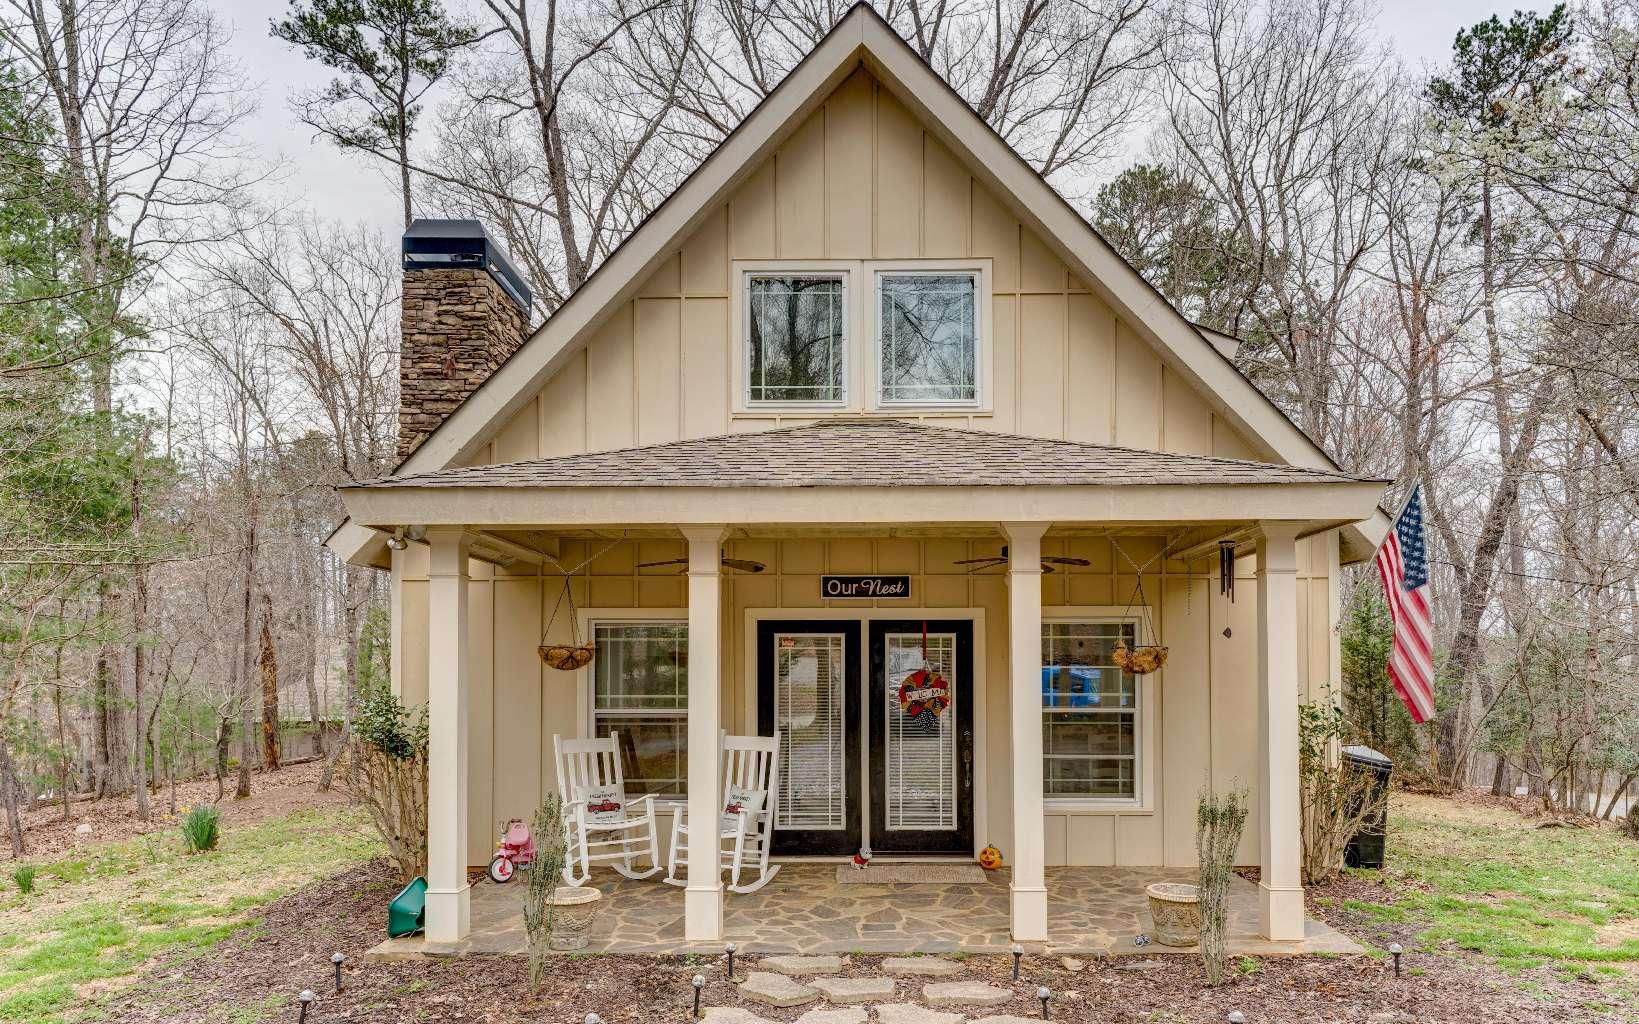 481 HURON CIRCLE, Ellijay, Georgia 30540, 2 Bedrooms Bedrooms, ,2 BathroomsBathrooms,Single Family,For Sale,481 HURON CIRCLE,305407